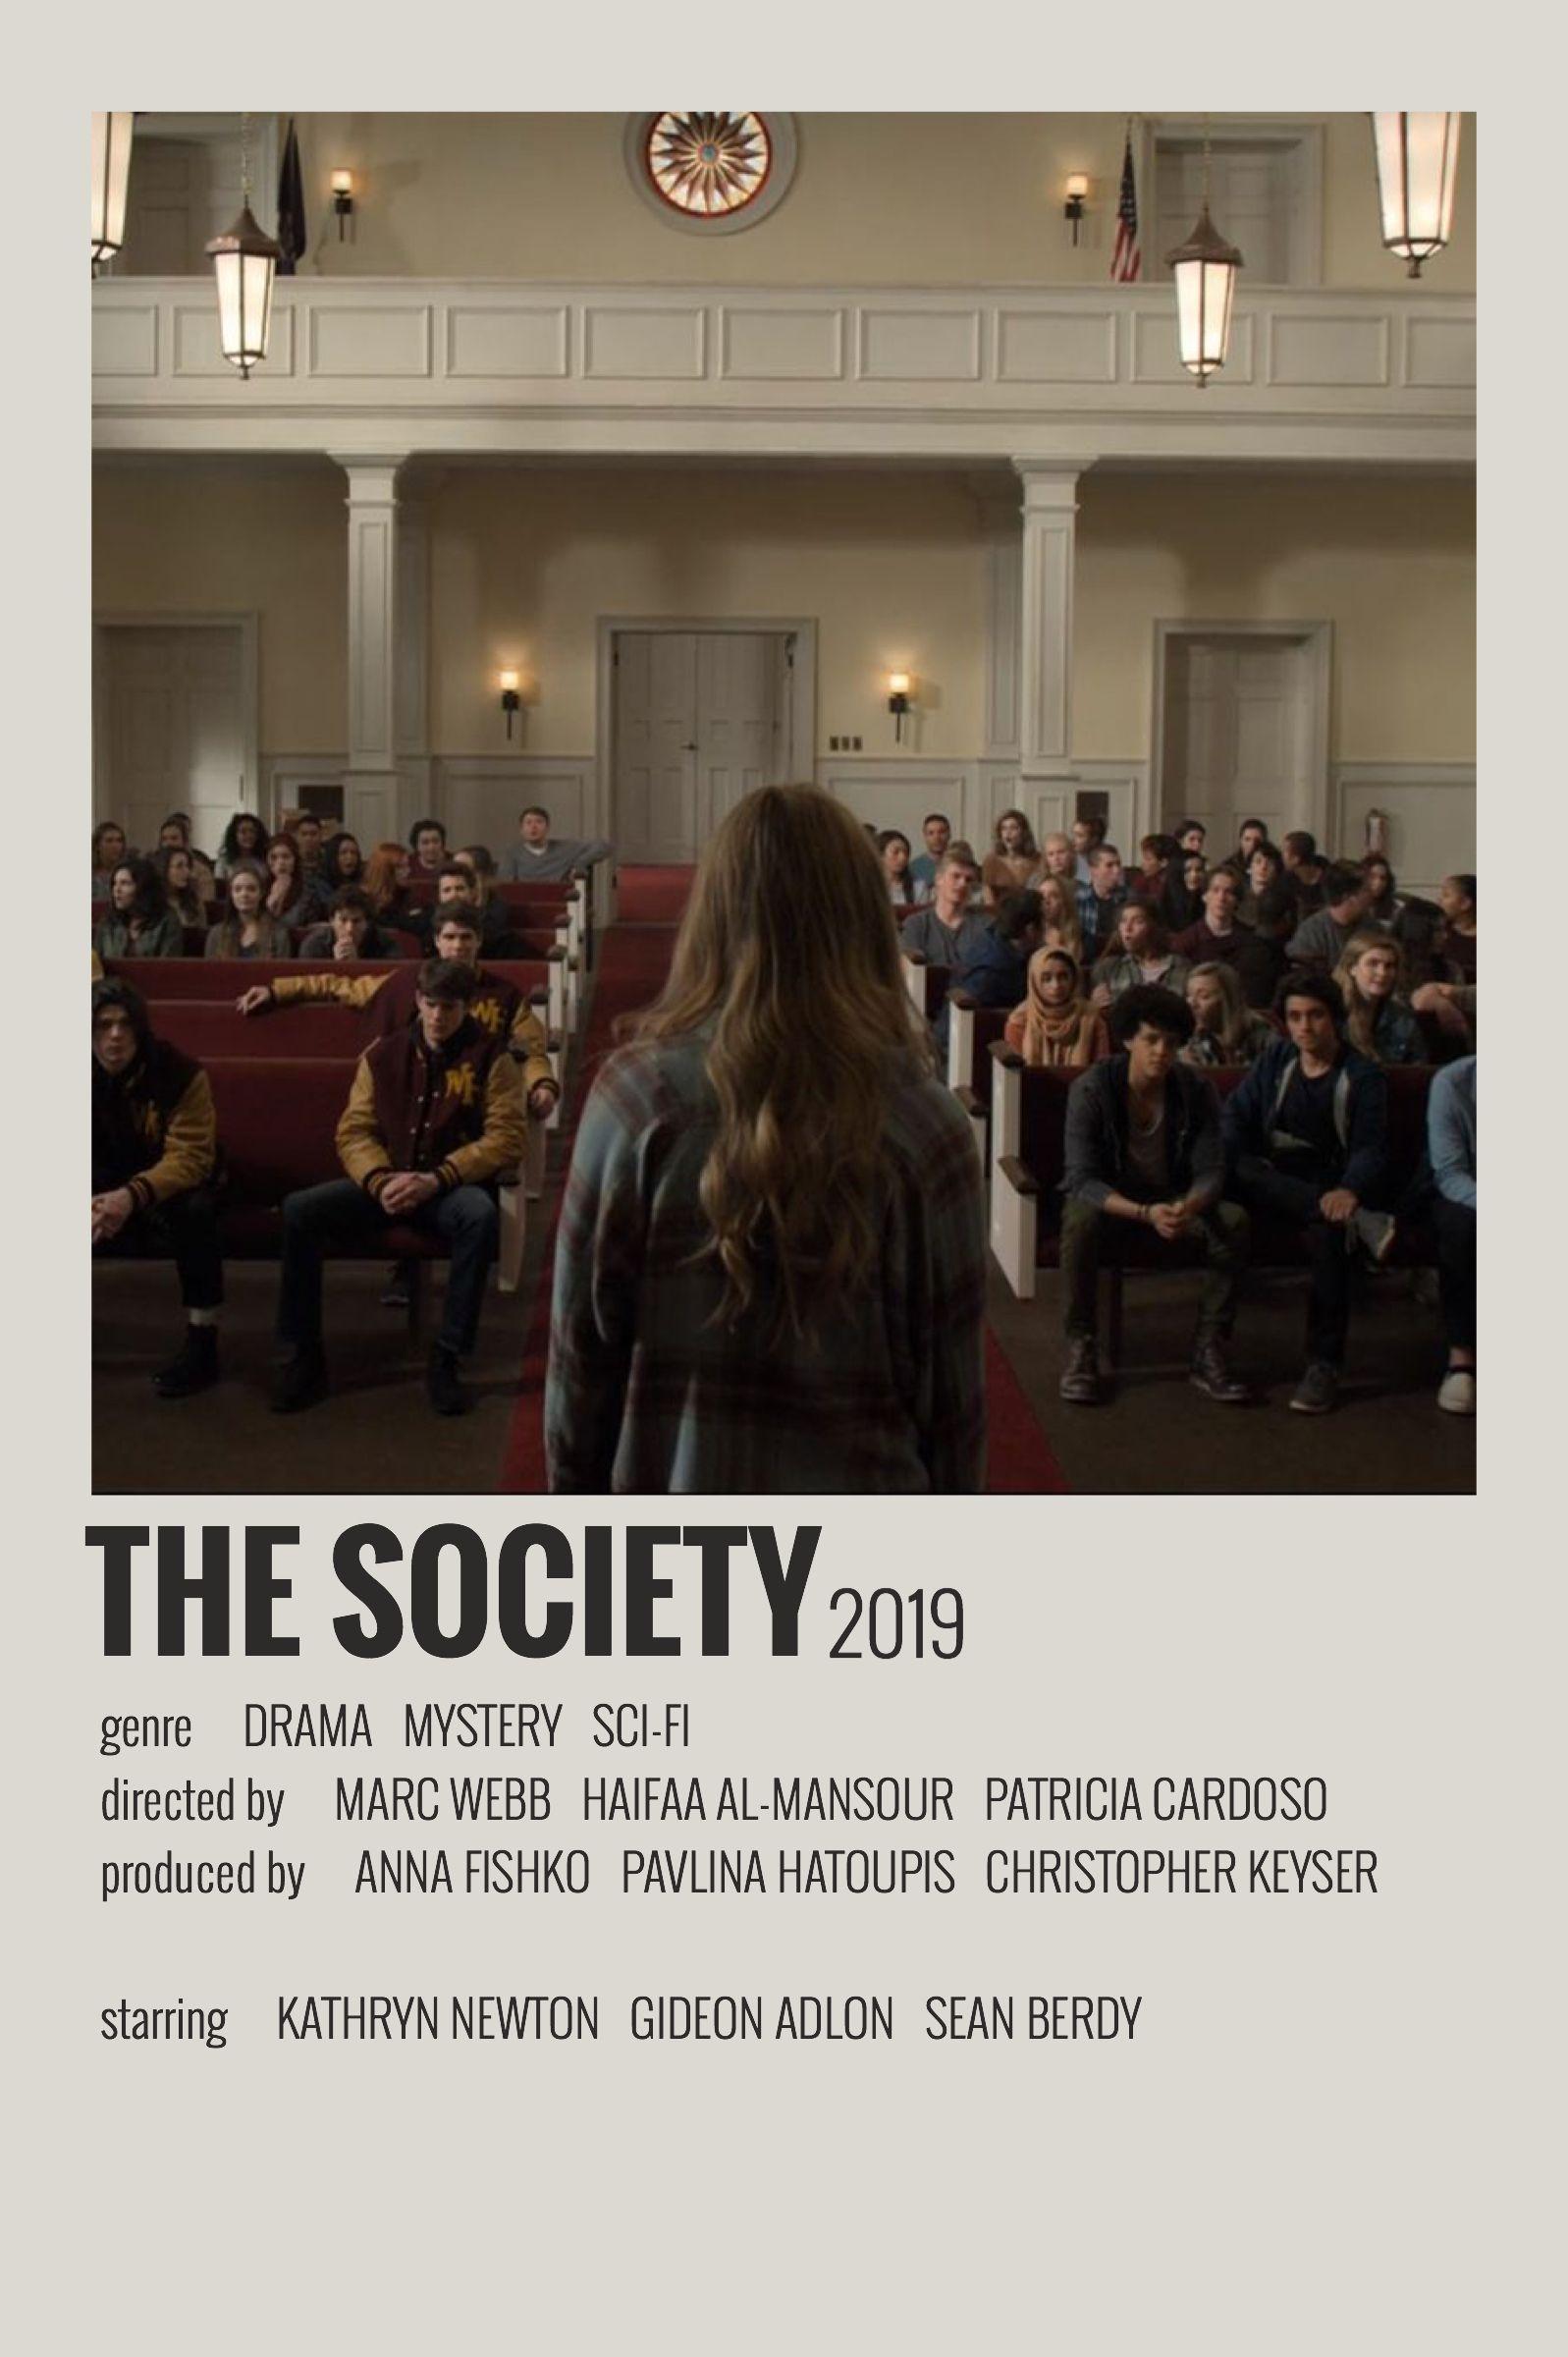 Alternative Minimalist Movie/Show Polaroid Poster - The Society